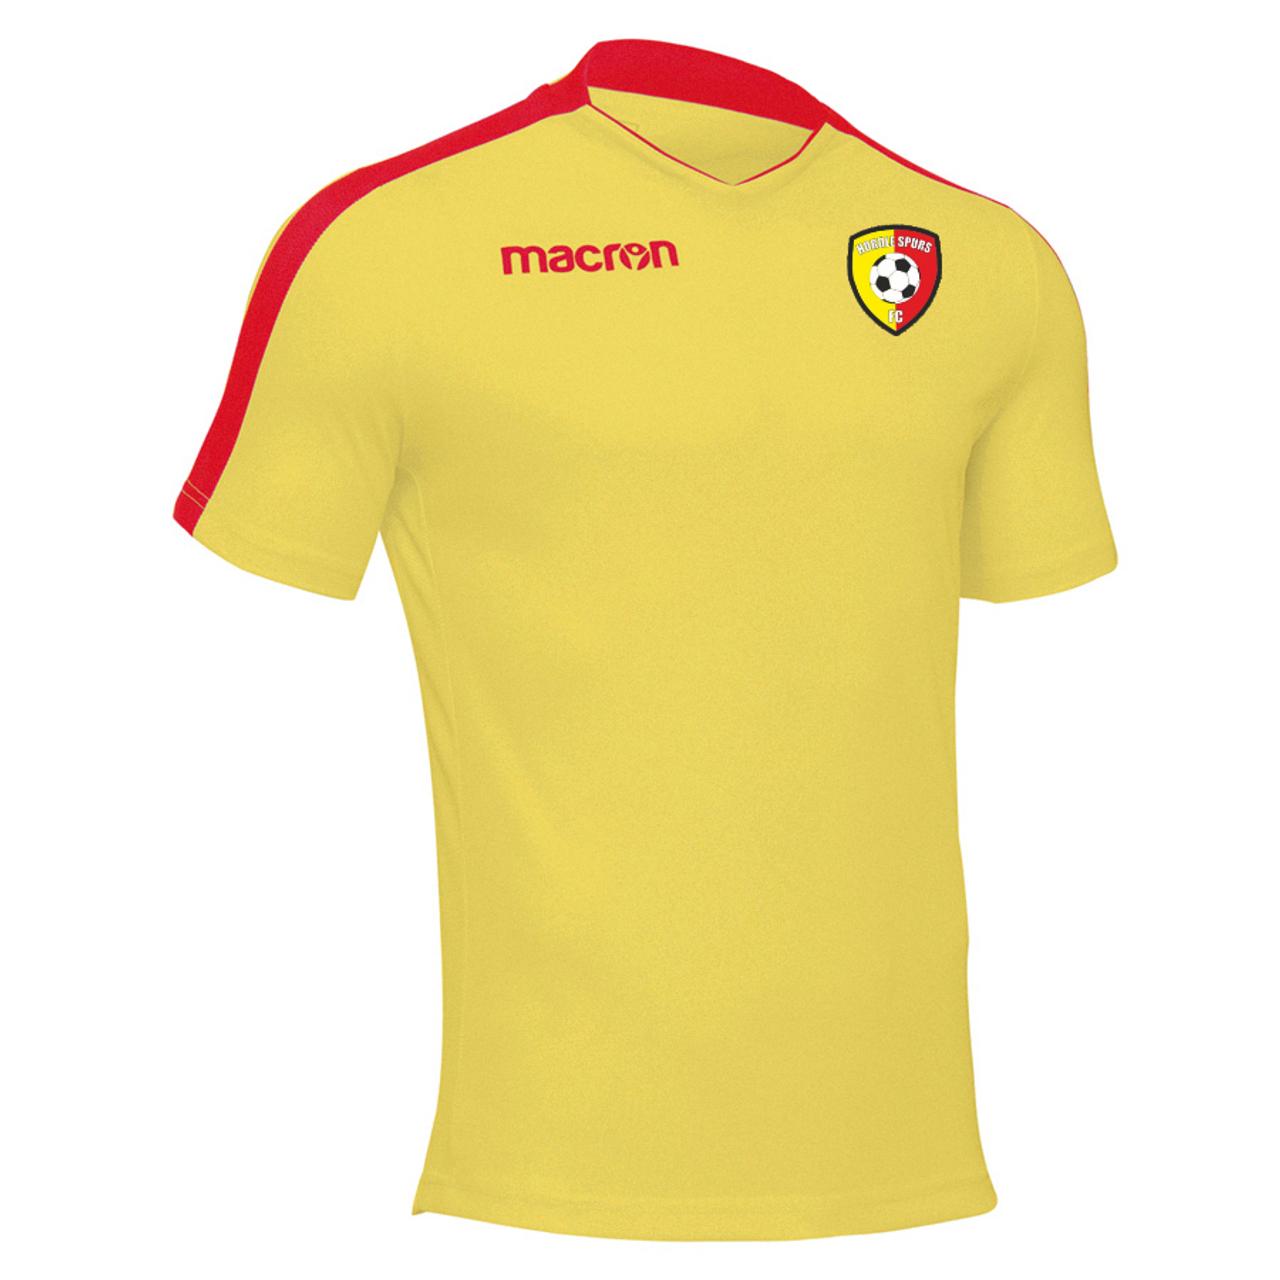 reputable site 8162c 3fa64 Hordle Spurs FC JNR Away Shirt